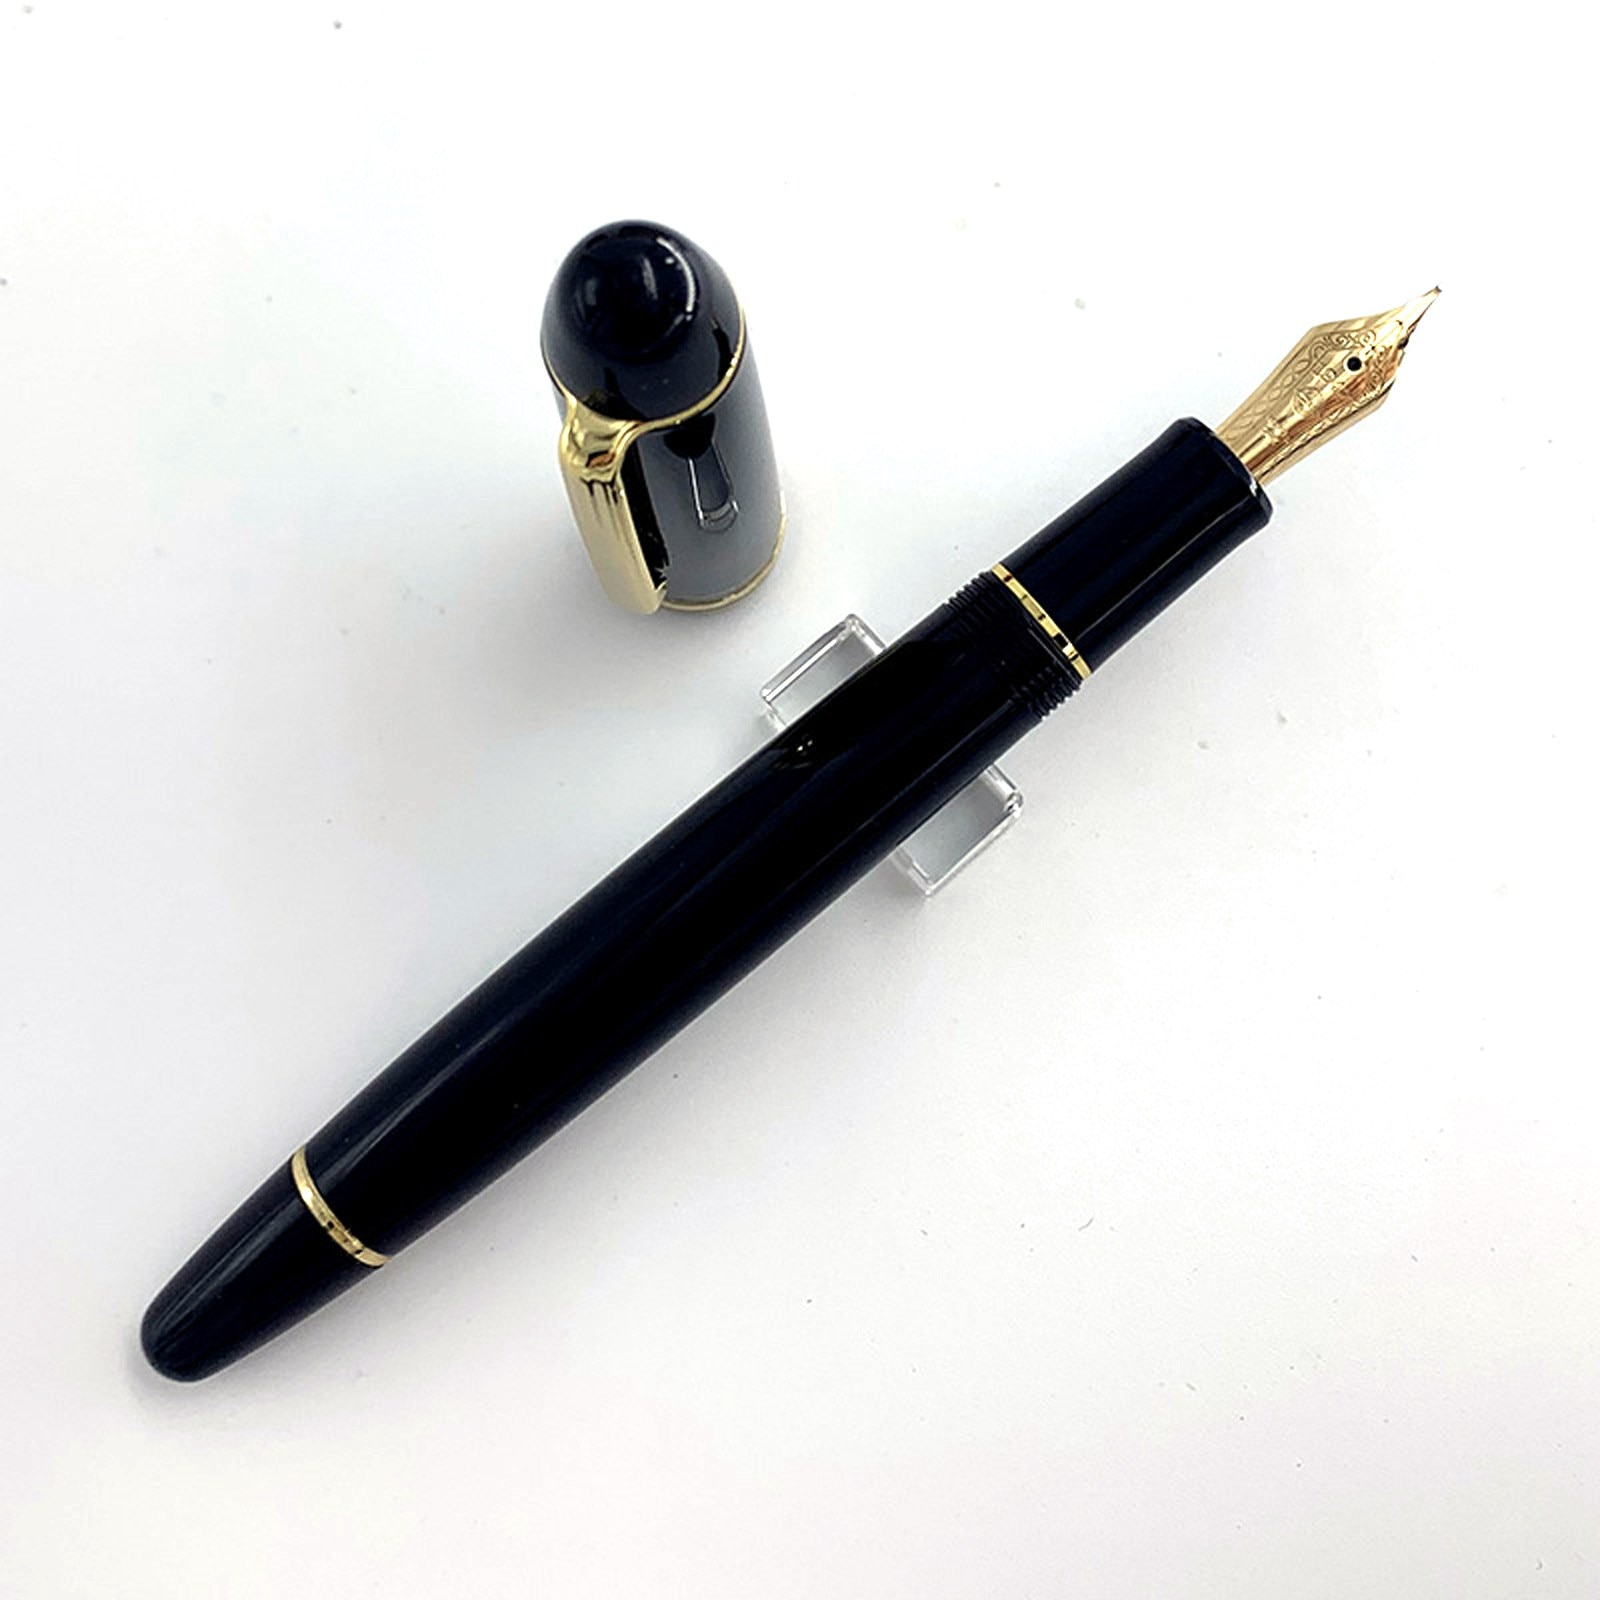 Wing Sung-قلم حبر راتينج 628 ، مع محول EF/F ، لون ذهبي 14 كيلو ، أداة حشو ، مكتب ، مدرسة ، كتابة ، أجنحة